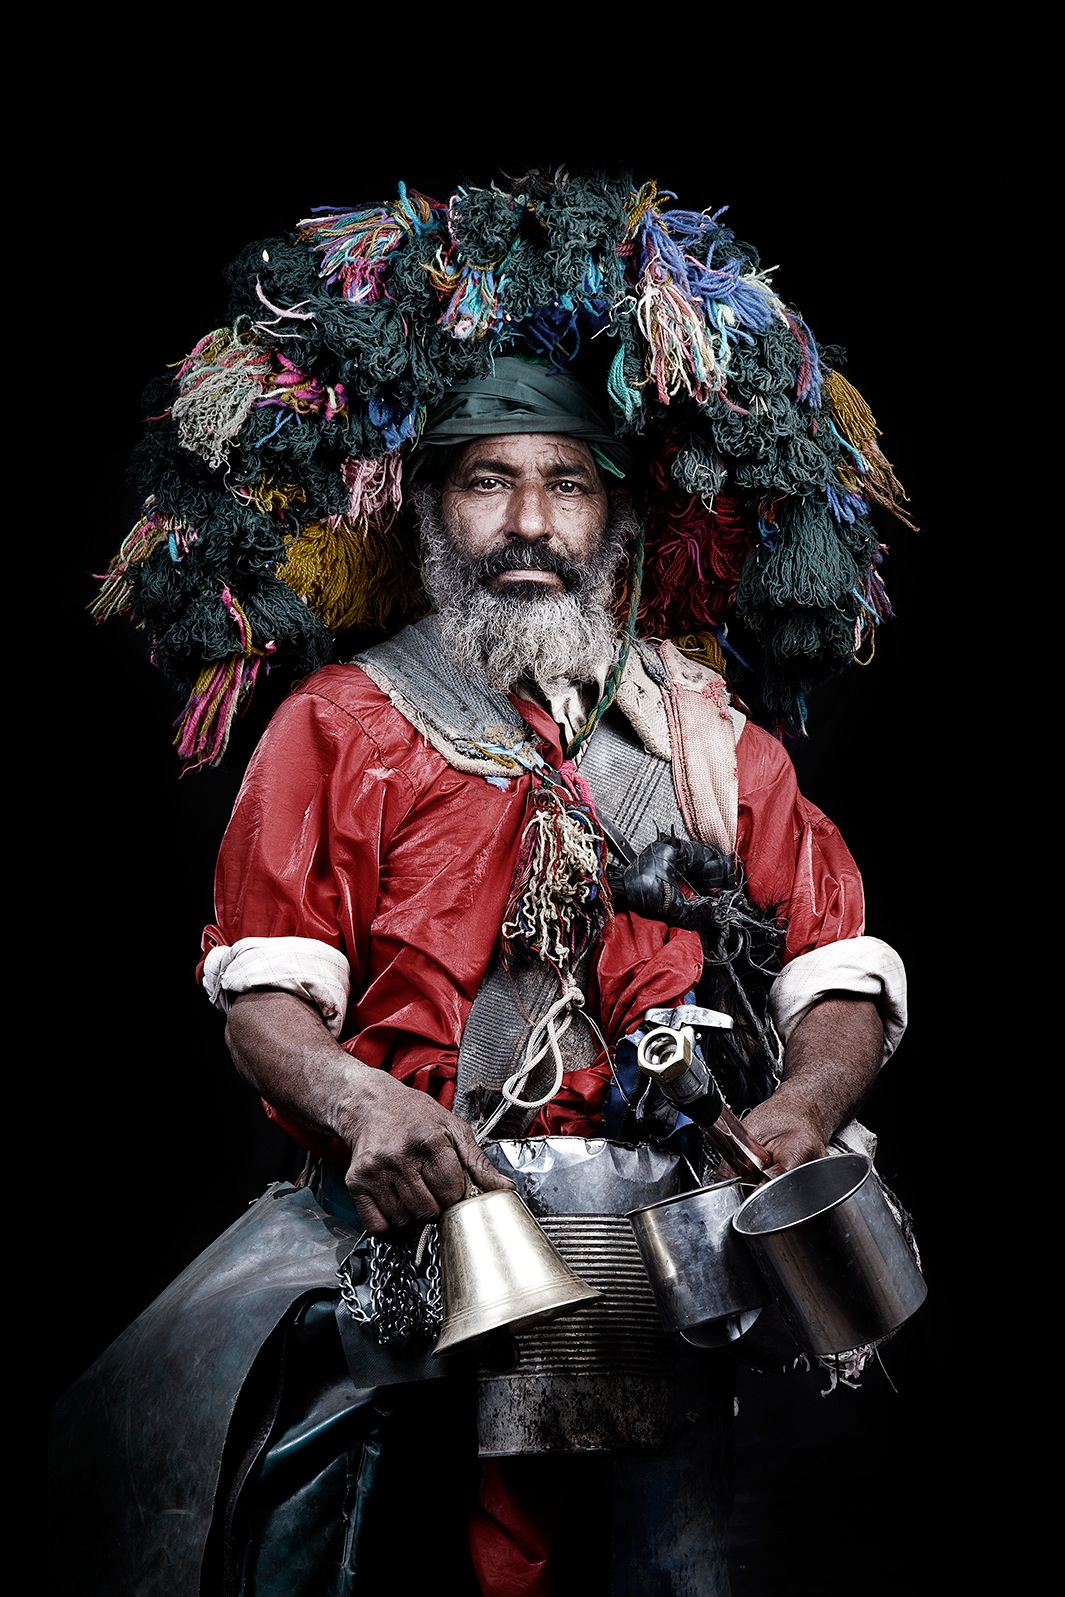 Марокканцы - портреты от Лейлы Алауи-01